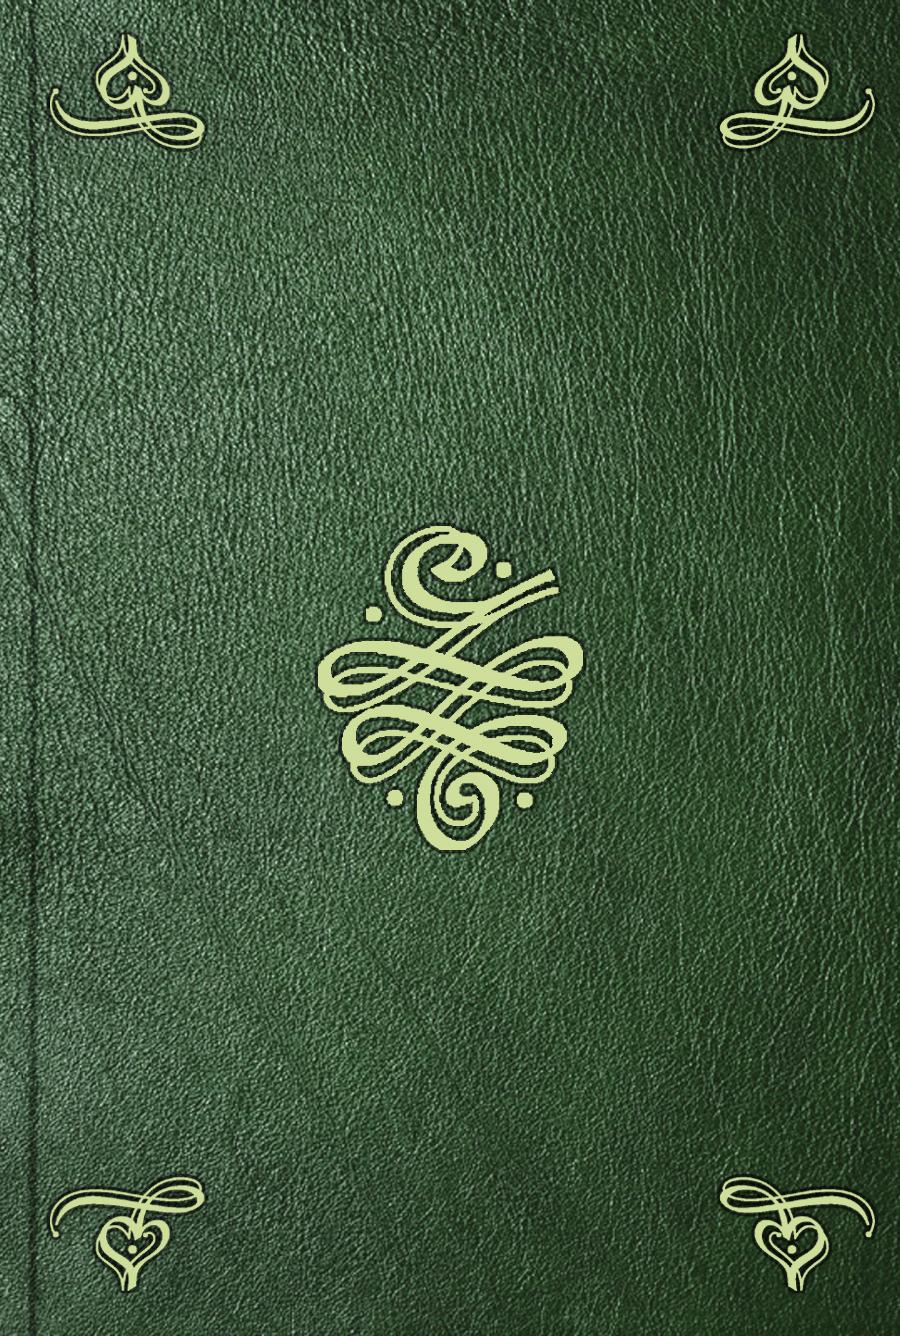 de Caylus Oeuvres badines complettes. T. 6. P. 2 anthony ashley shaftsbury les oeuvres de mylord comte de shaftsbury t 1